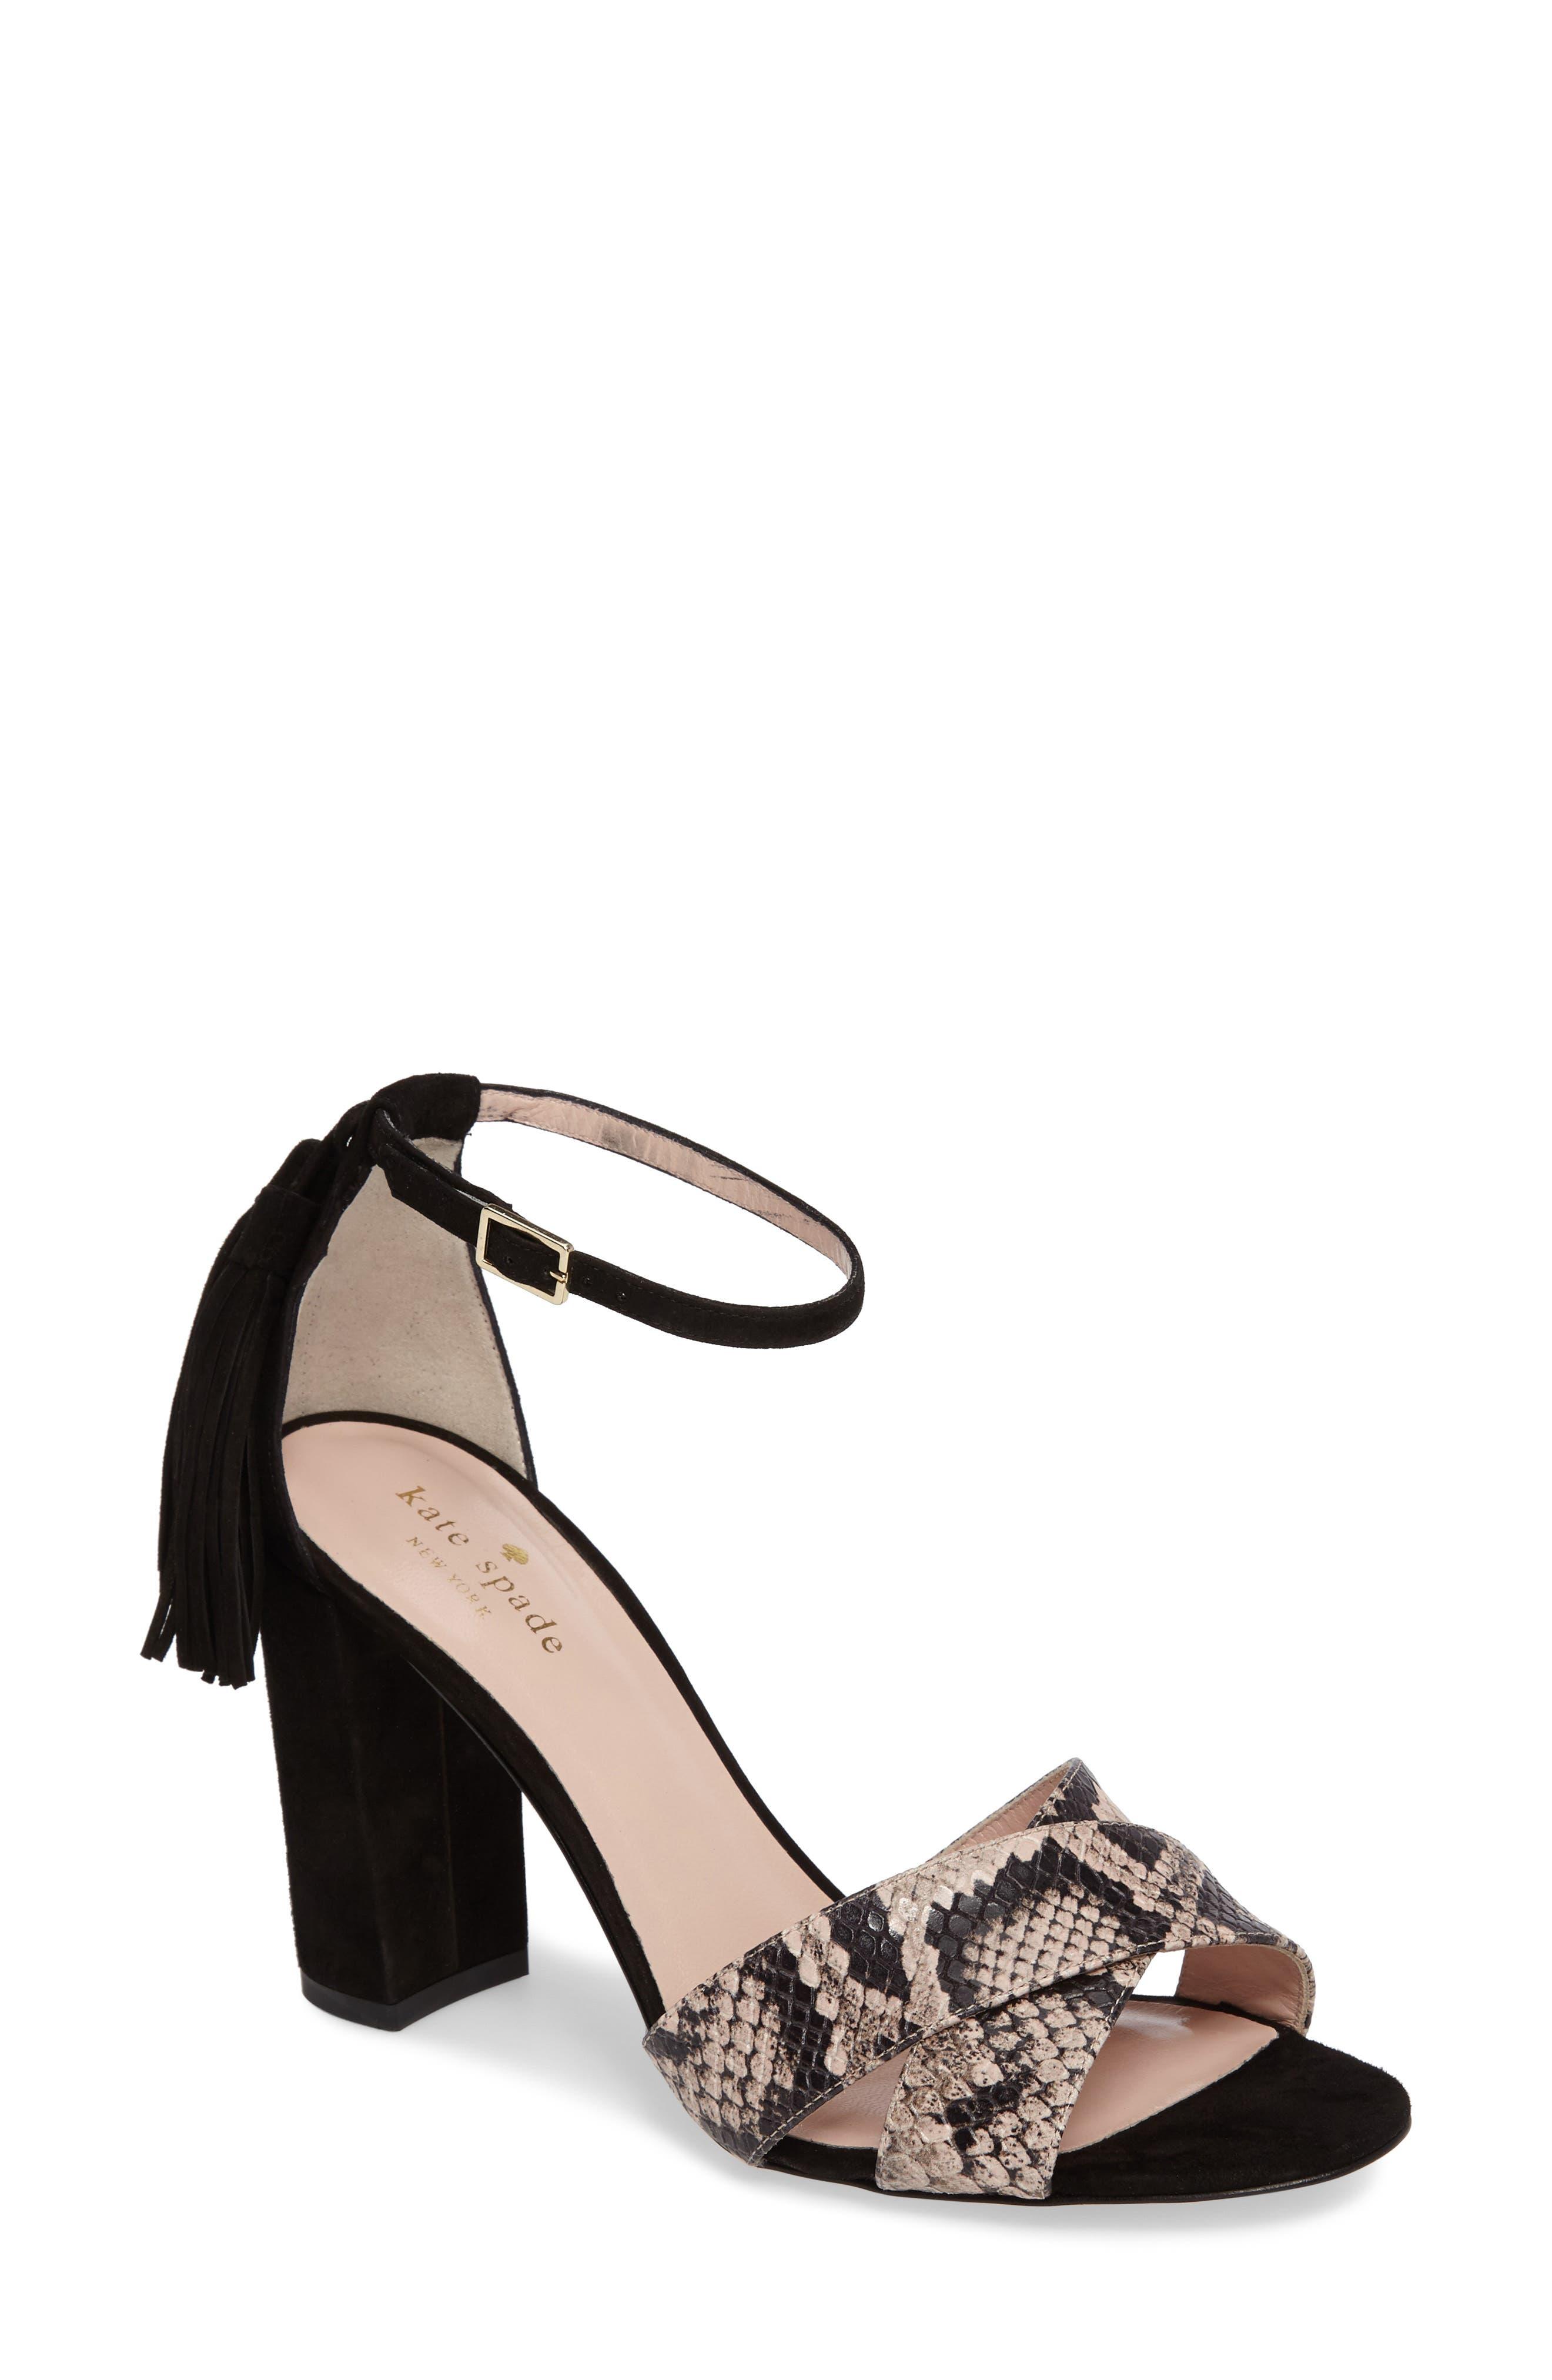 Alternate Image 1 Selected - kate spade new york idanna sandal (Women)